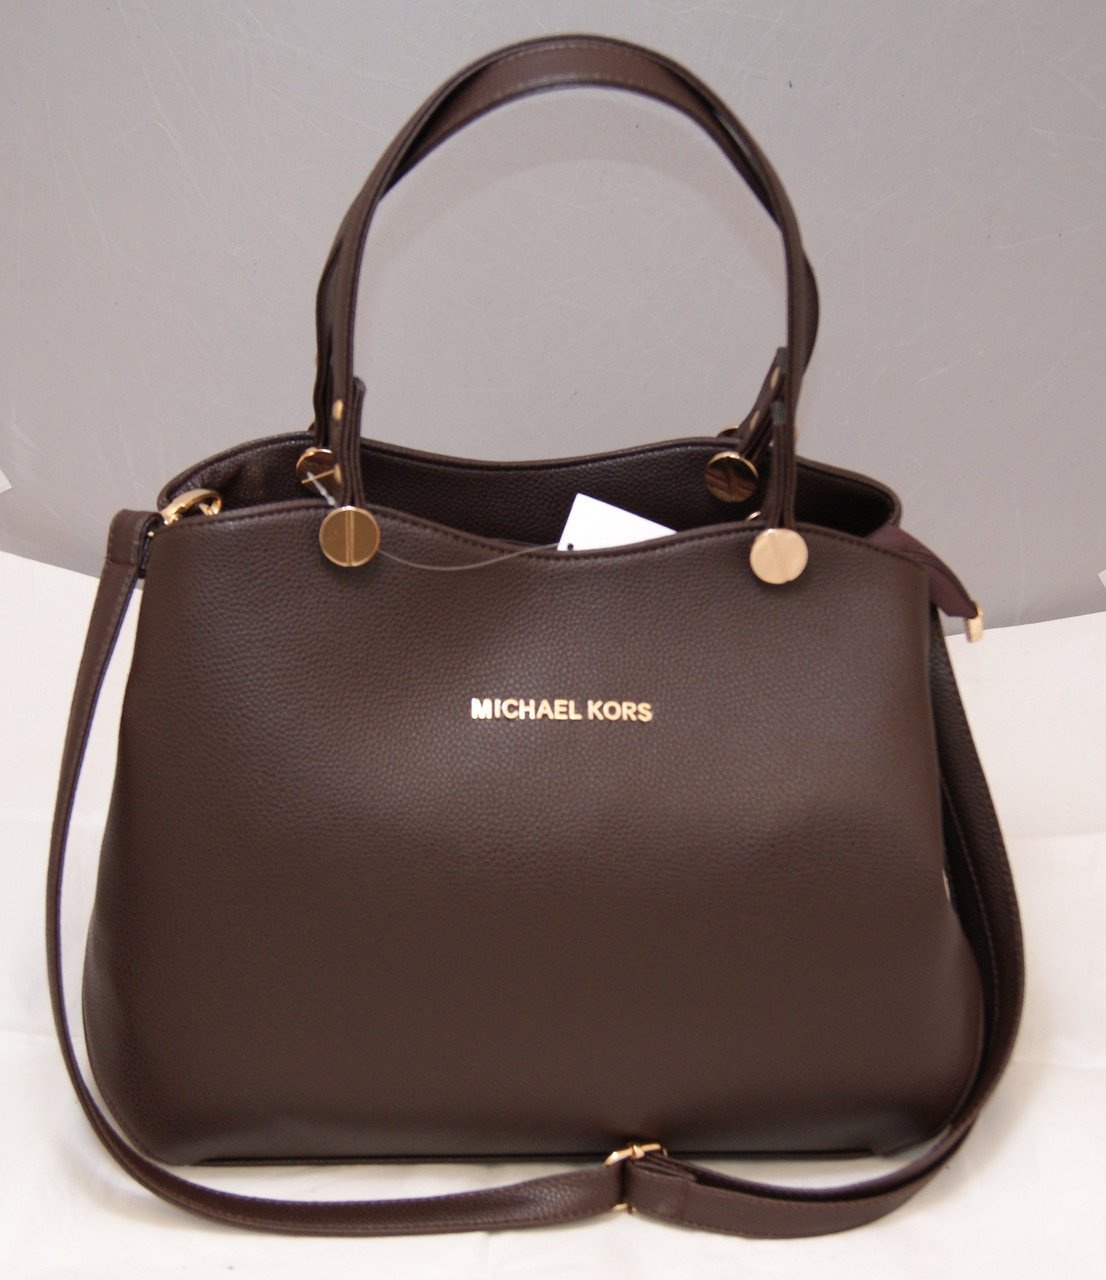 f5c22f1e509e Женская сумка Michael Kors, цвет коричневый шоколад Майкл Корс MK ...